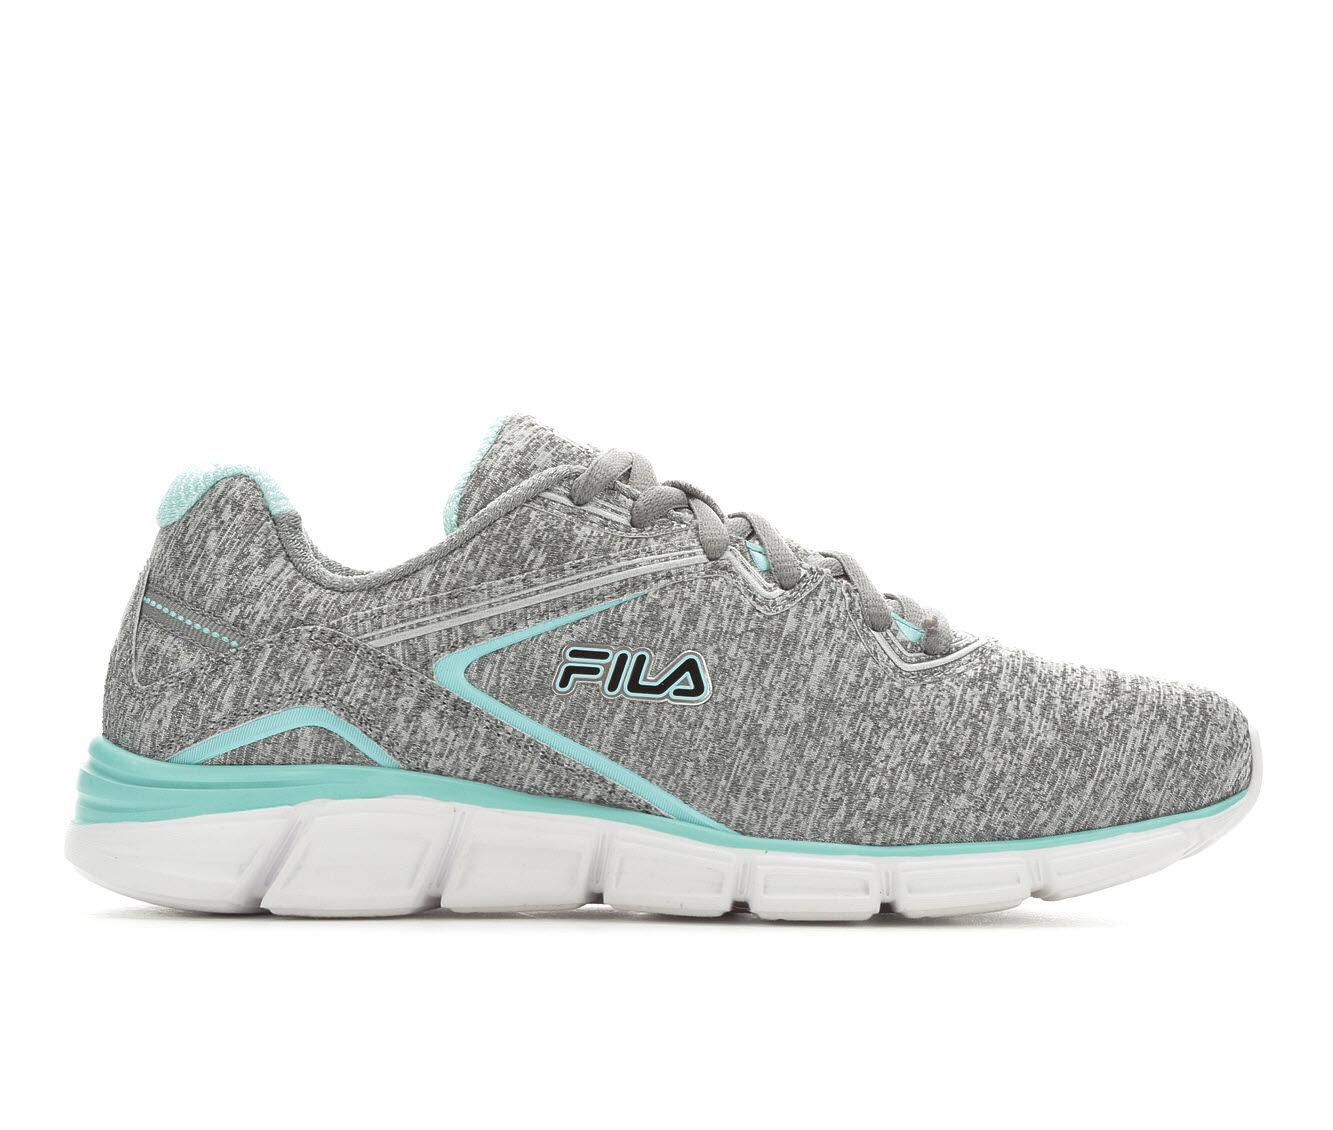 uk shoes_kd4494